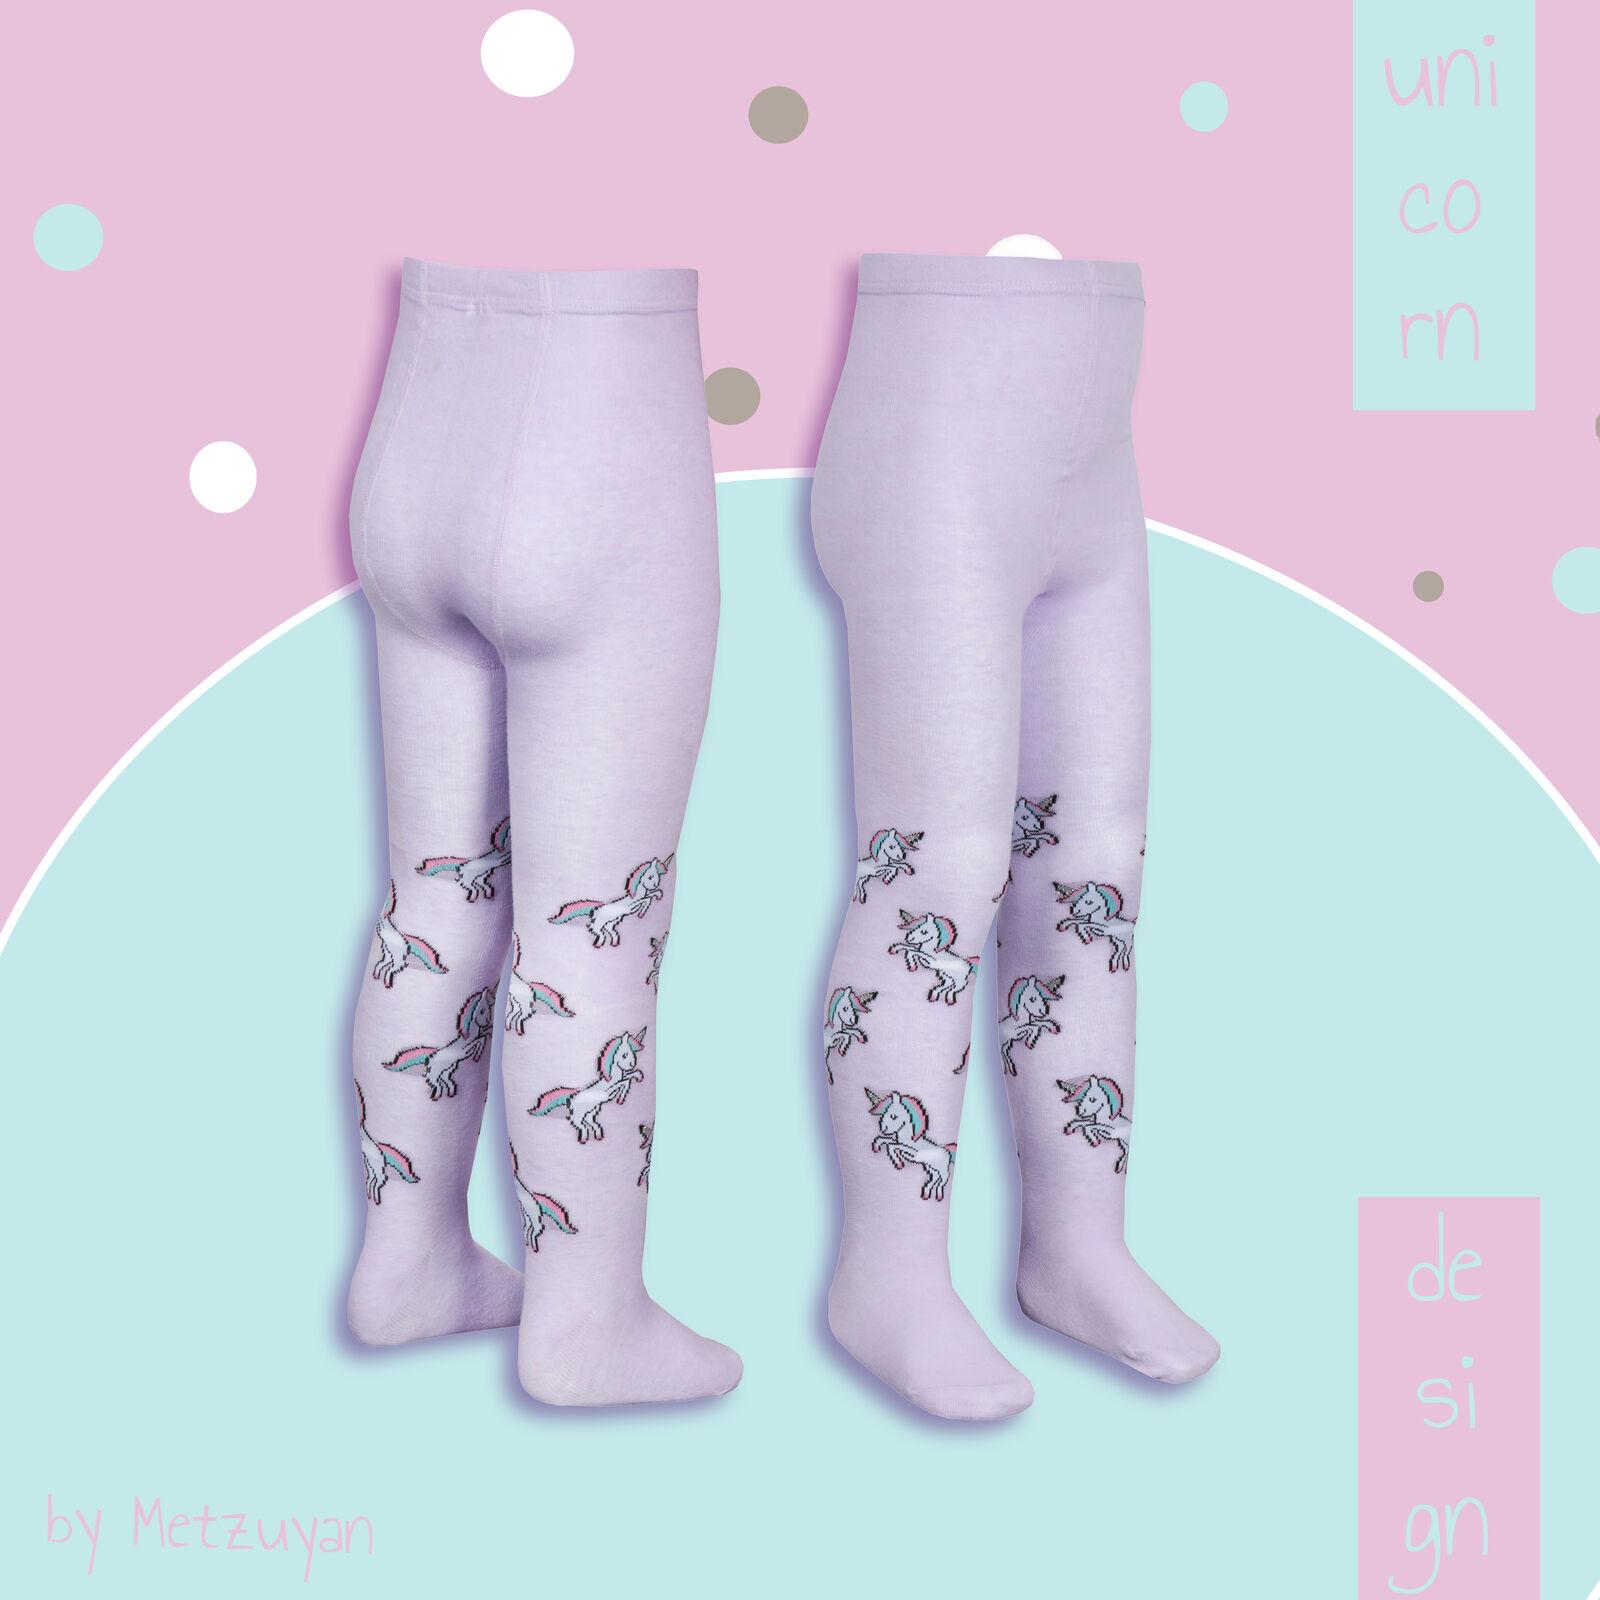 2 Pack Girls Tights Cotton Rich Novelty Pattern Unicorn Thick Warm Uniform School Size 2-8 Years